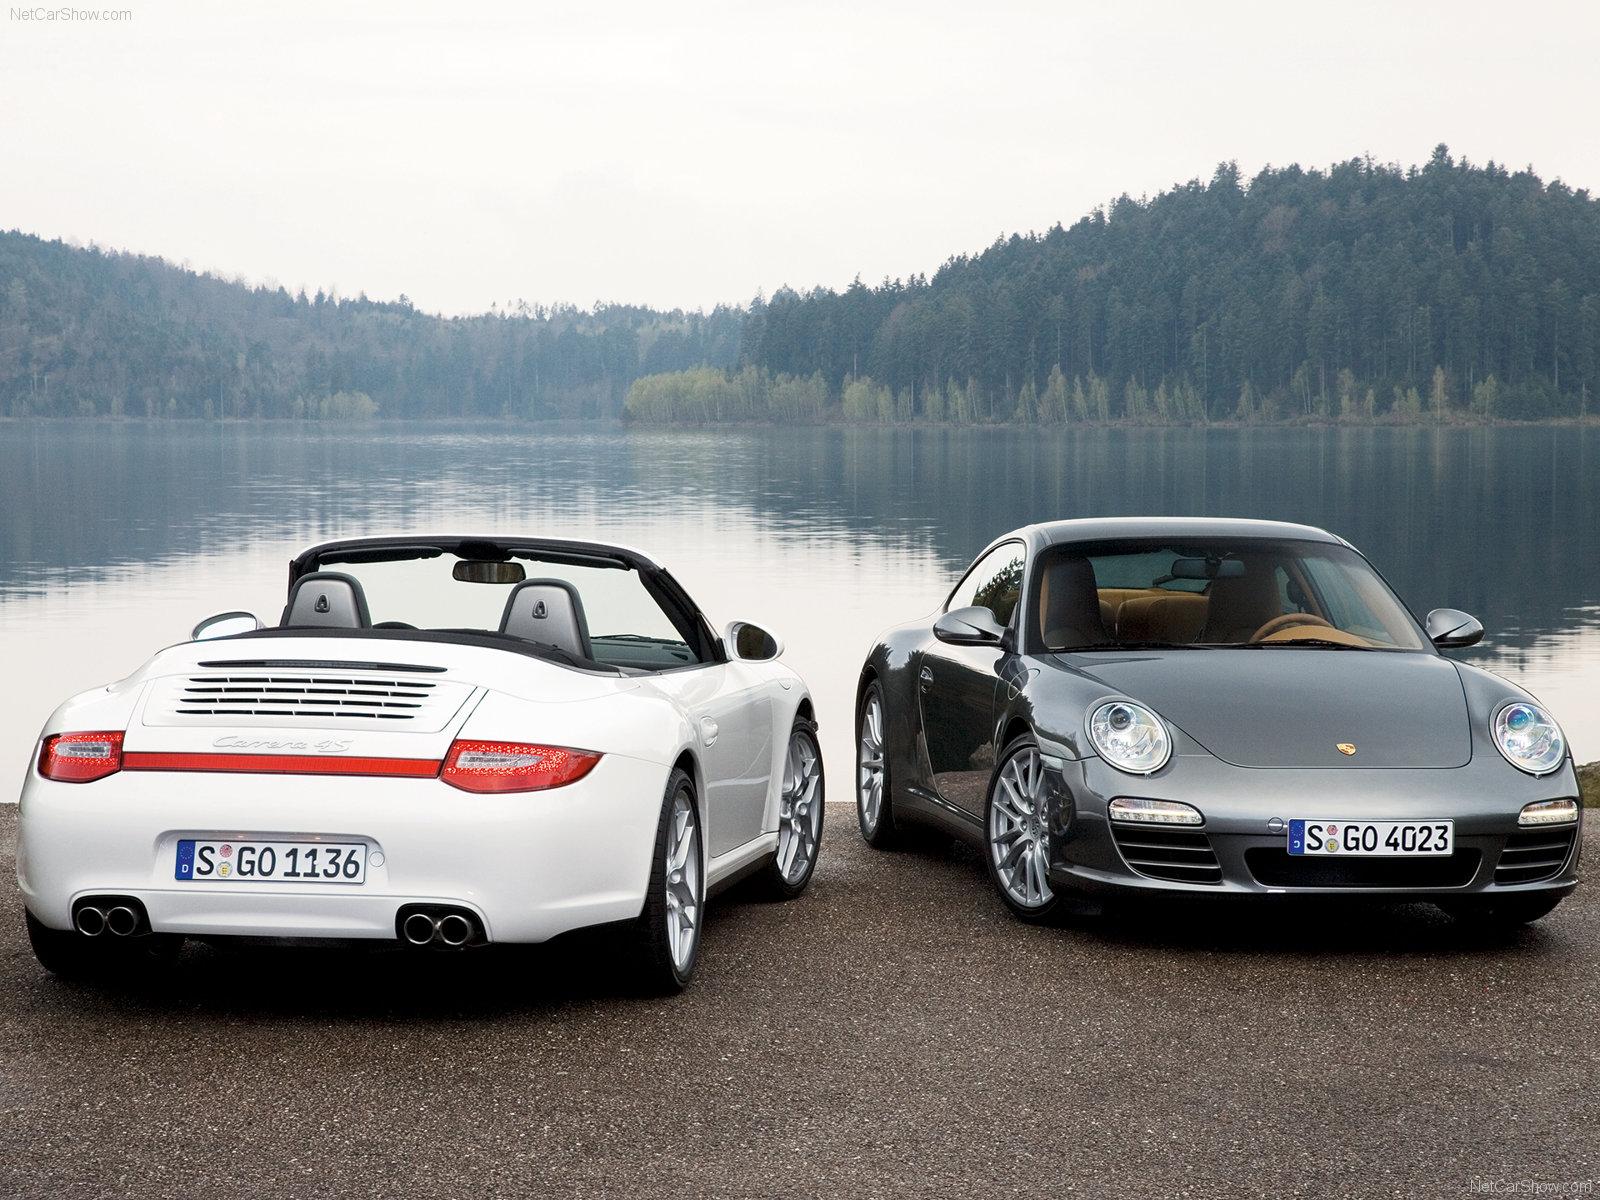 2009 white porsche 911 carrera 4 cabriolet wallpapers. Black Bedroom Furniture Sets. Home Design Ideas